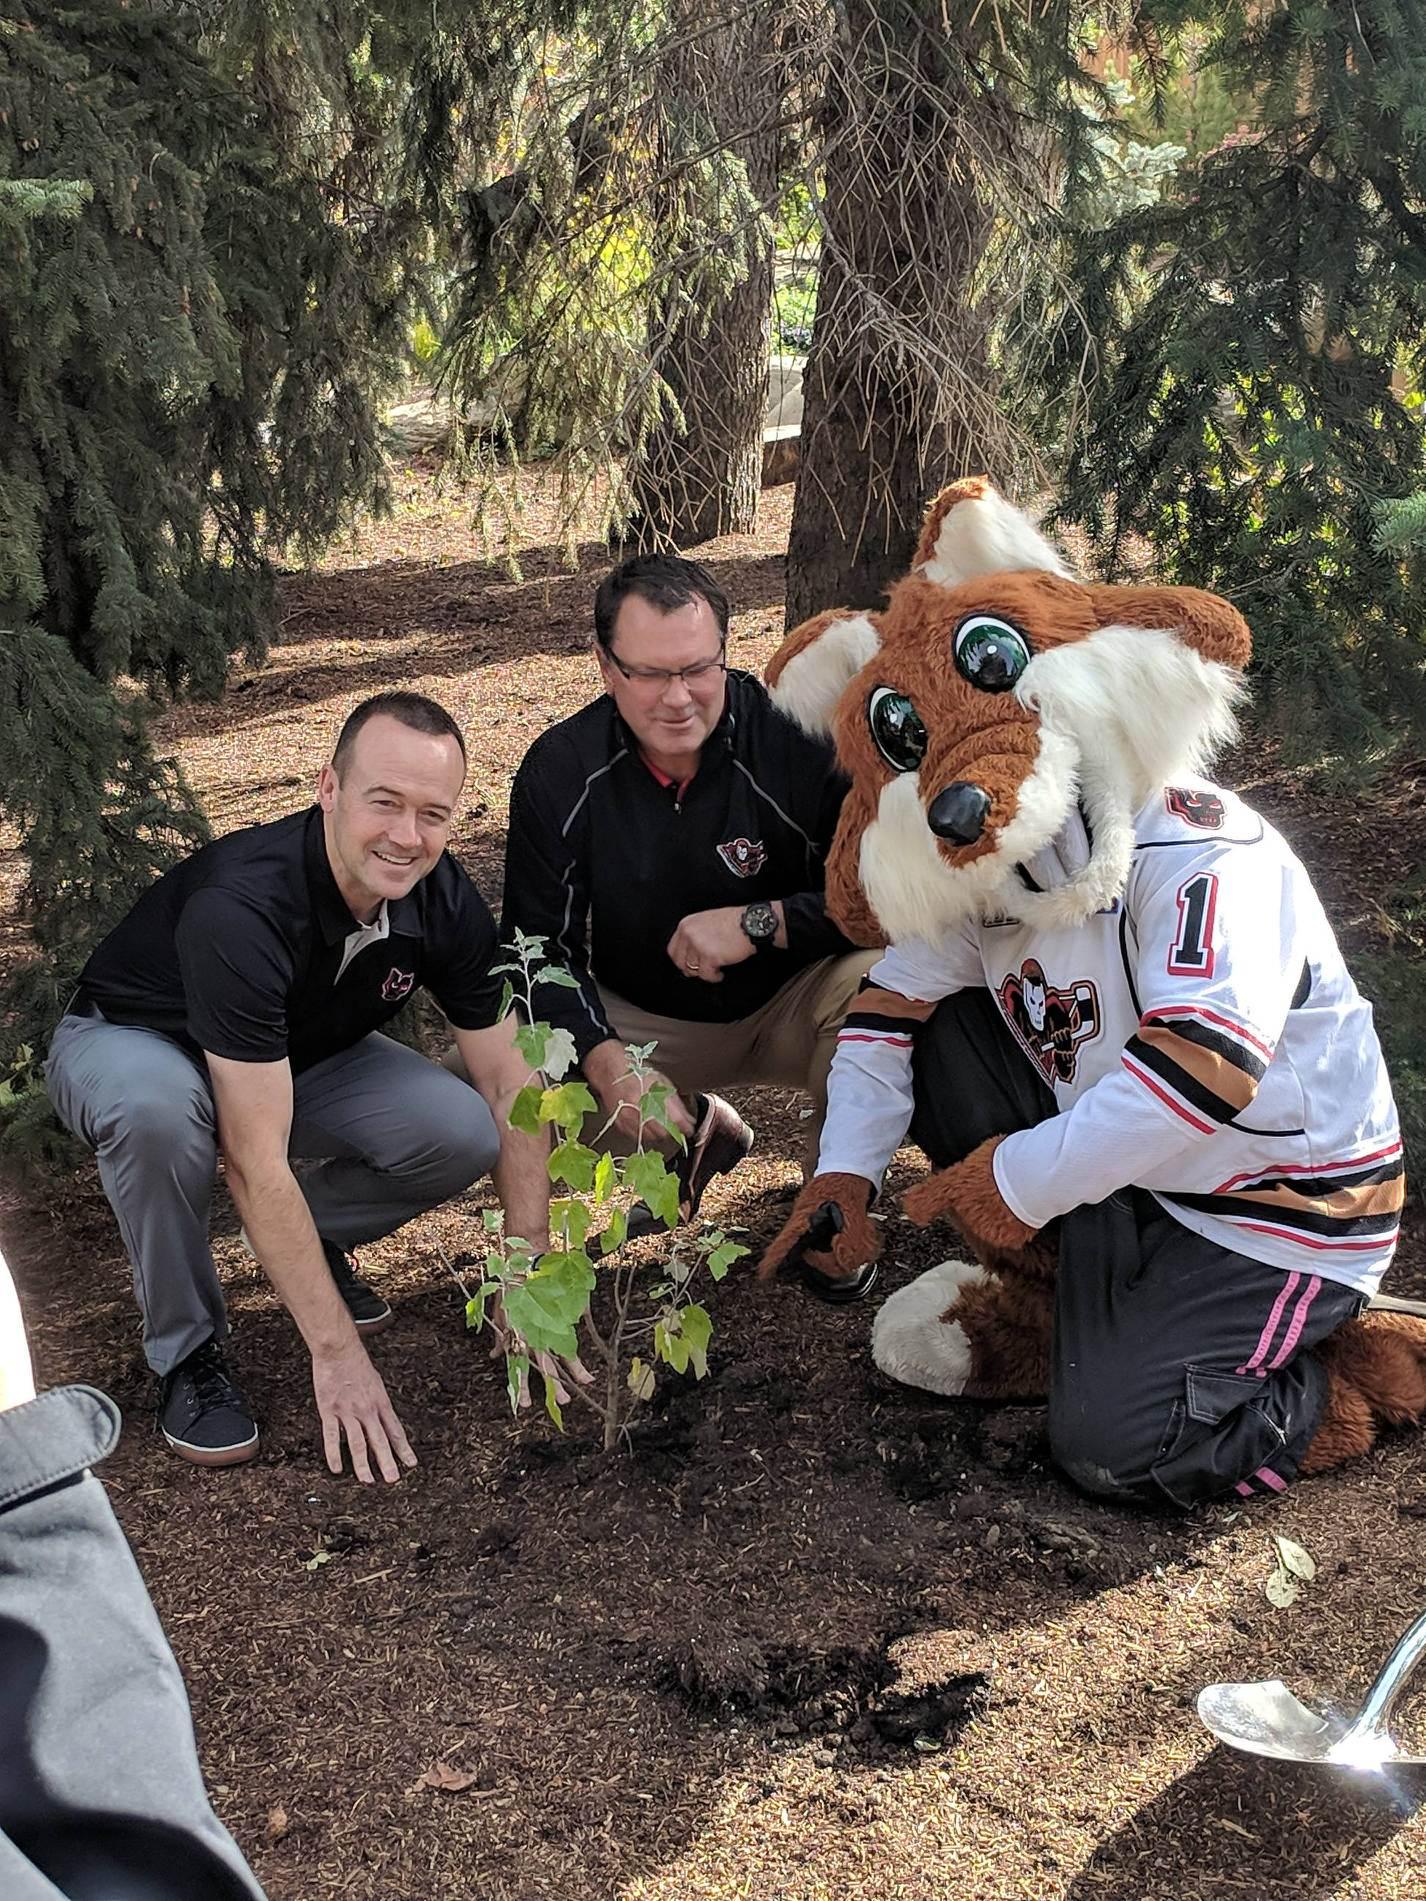 The Calgary Hitmen announce One-Ticket One-Tree initiative